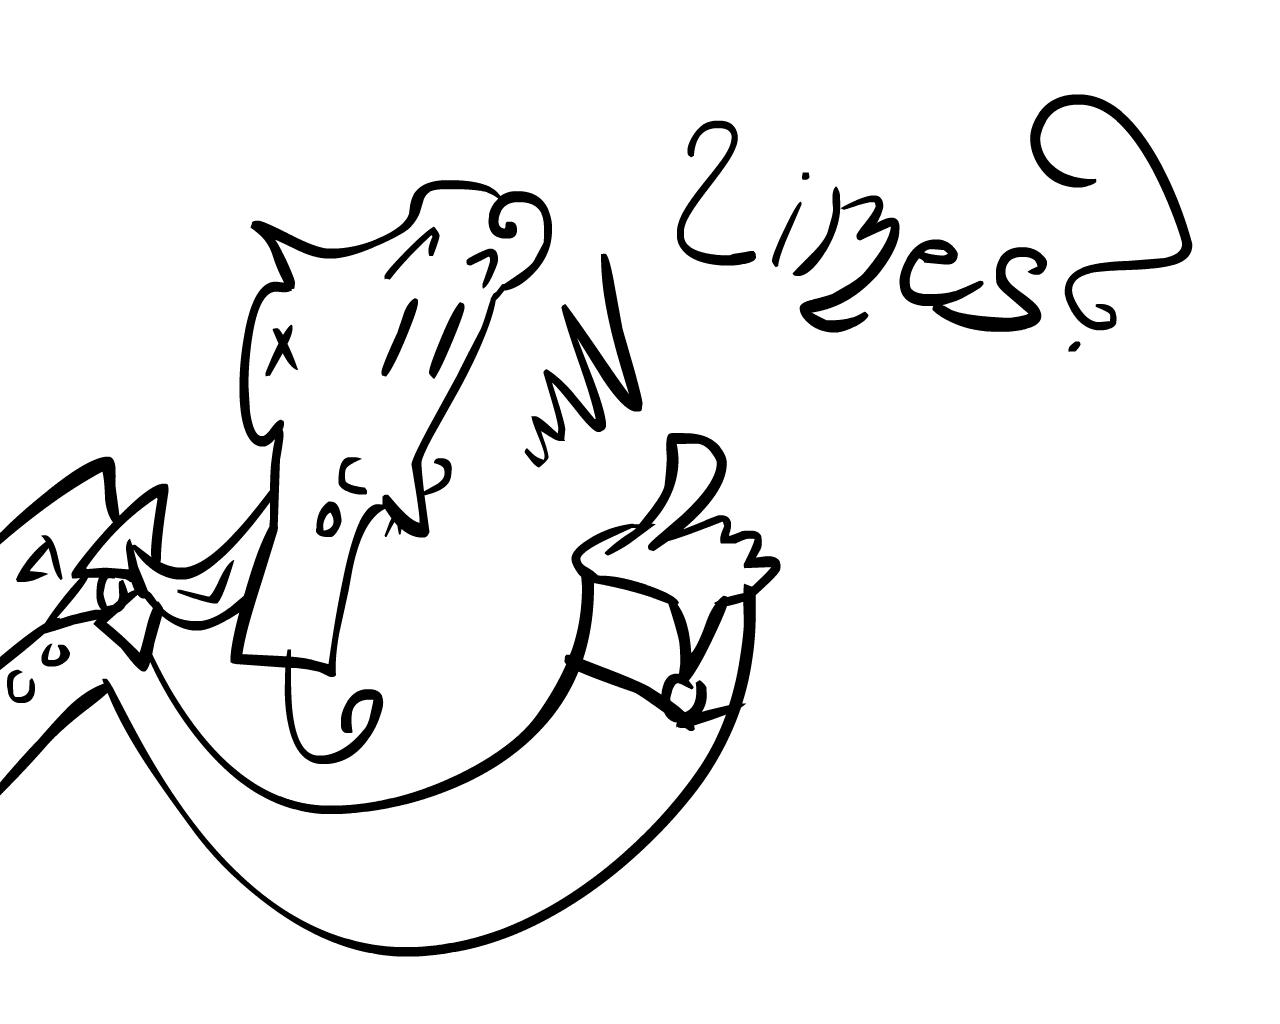 Limes?